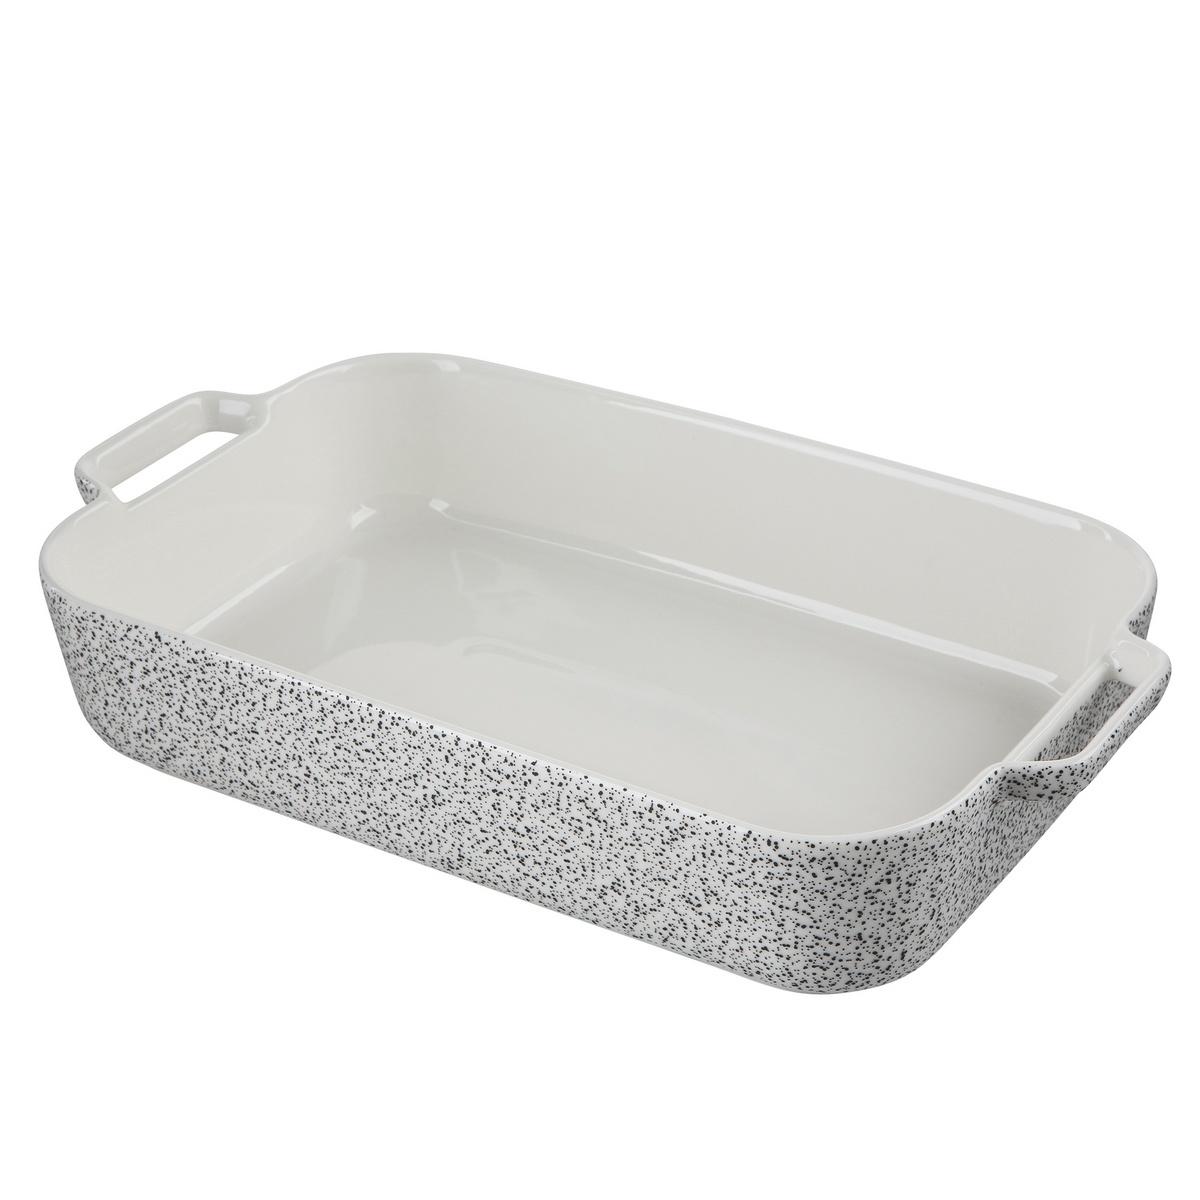 Altom Zapékací mísa Granit 30 x 17,5 x 6,5 cm, bílá, 30 x 17,5 x 6,5 cm